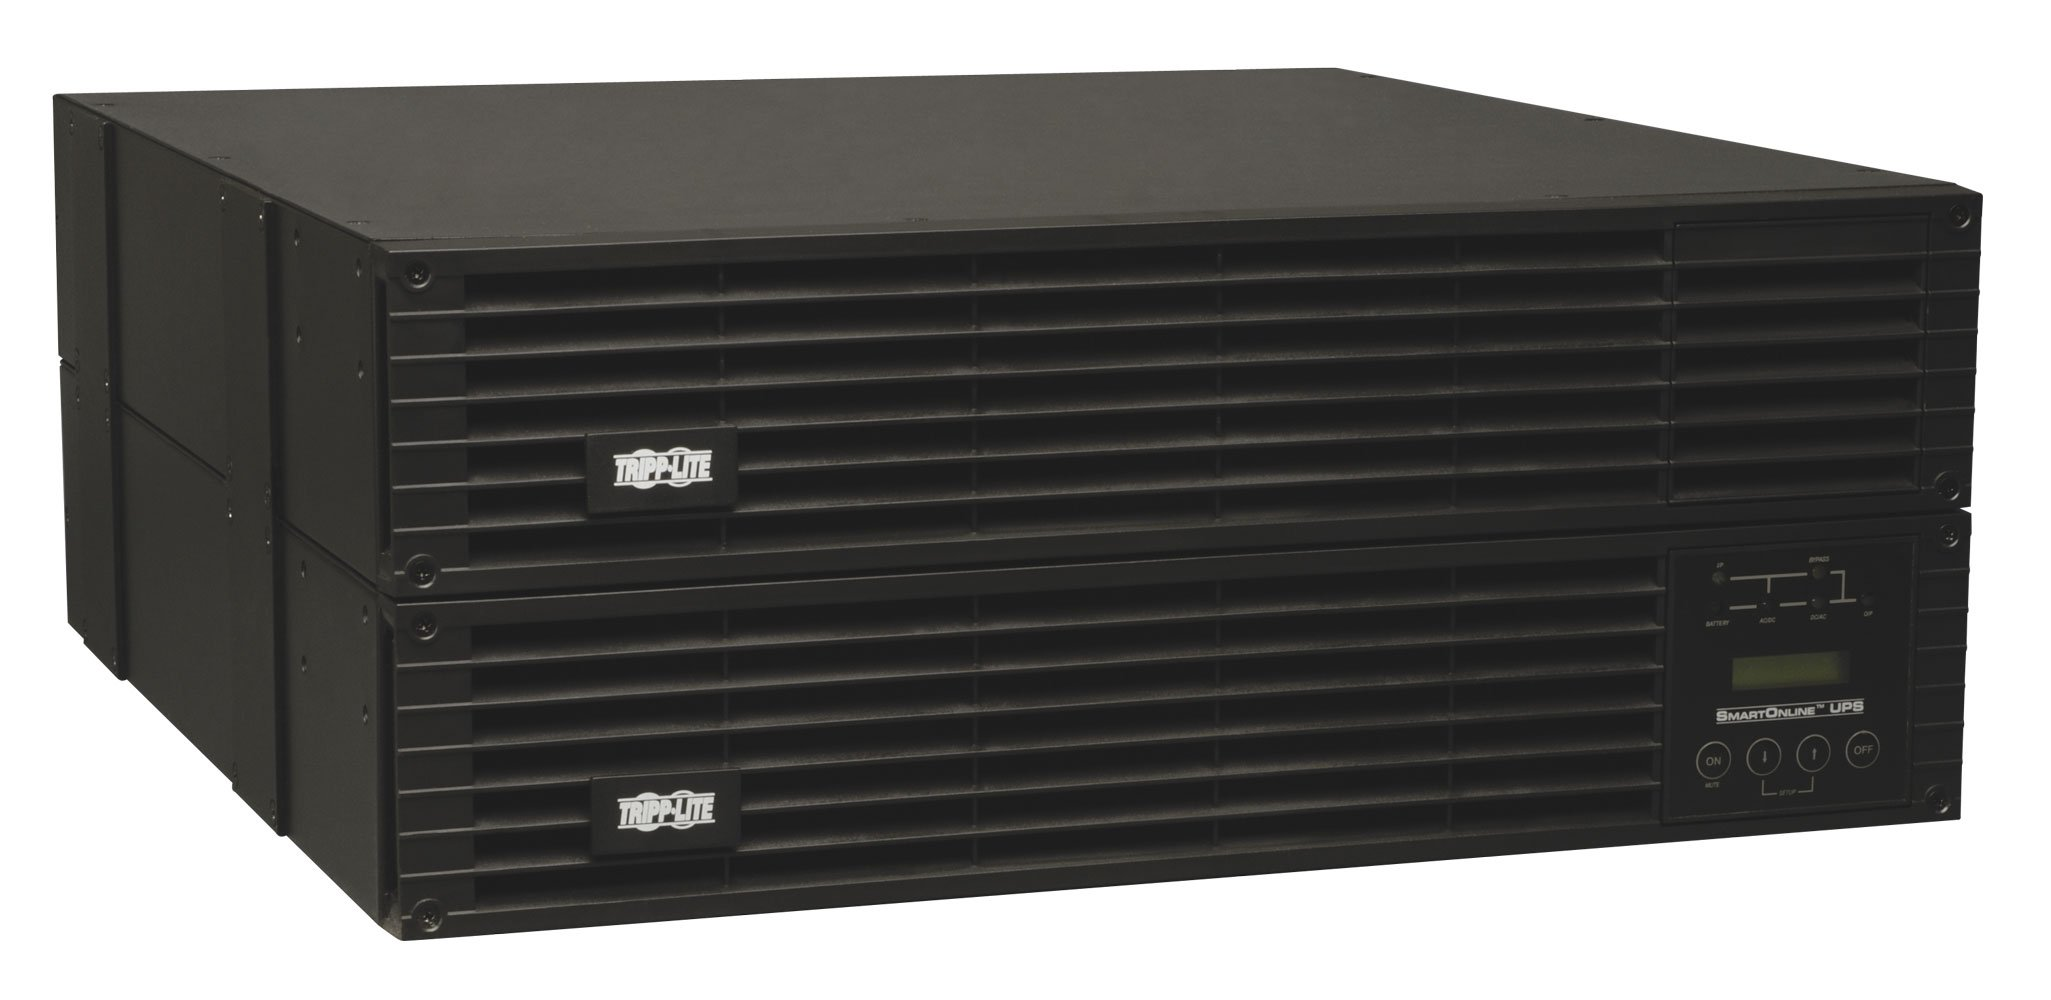 Tripp Lite SU6000RT4UHV 6000VA 5400W UPS Smart Online Rackmount 6kVA PDU 200-240V 4URM, 4 Outlets